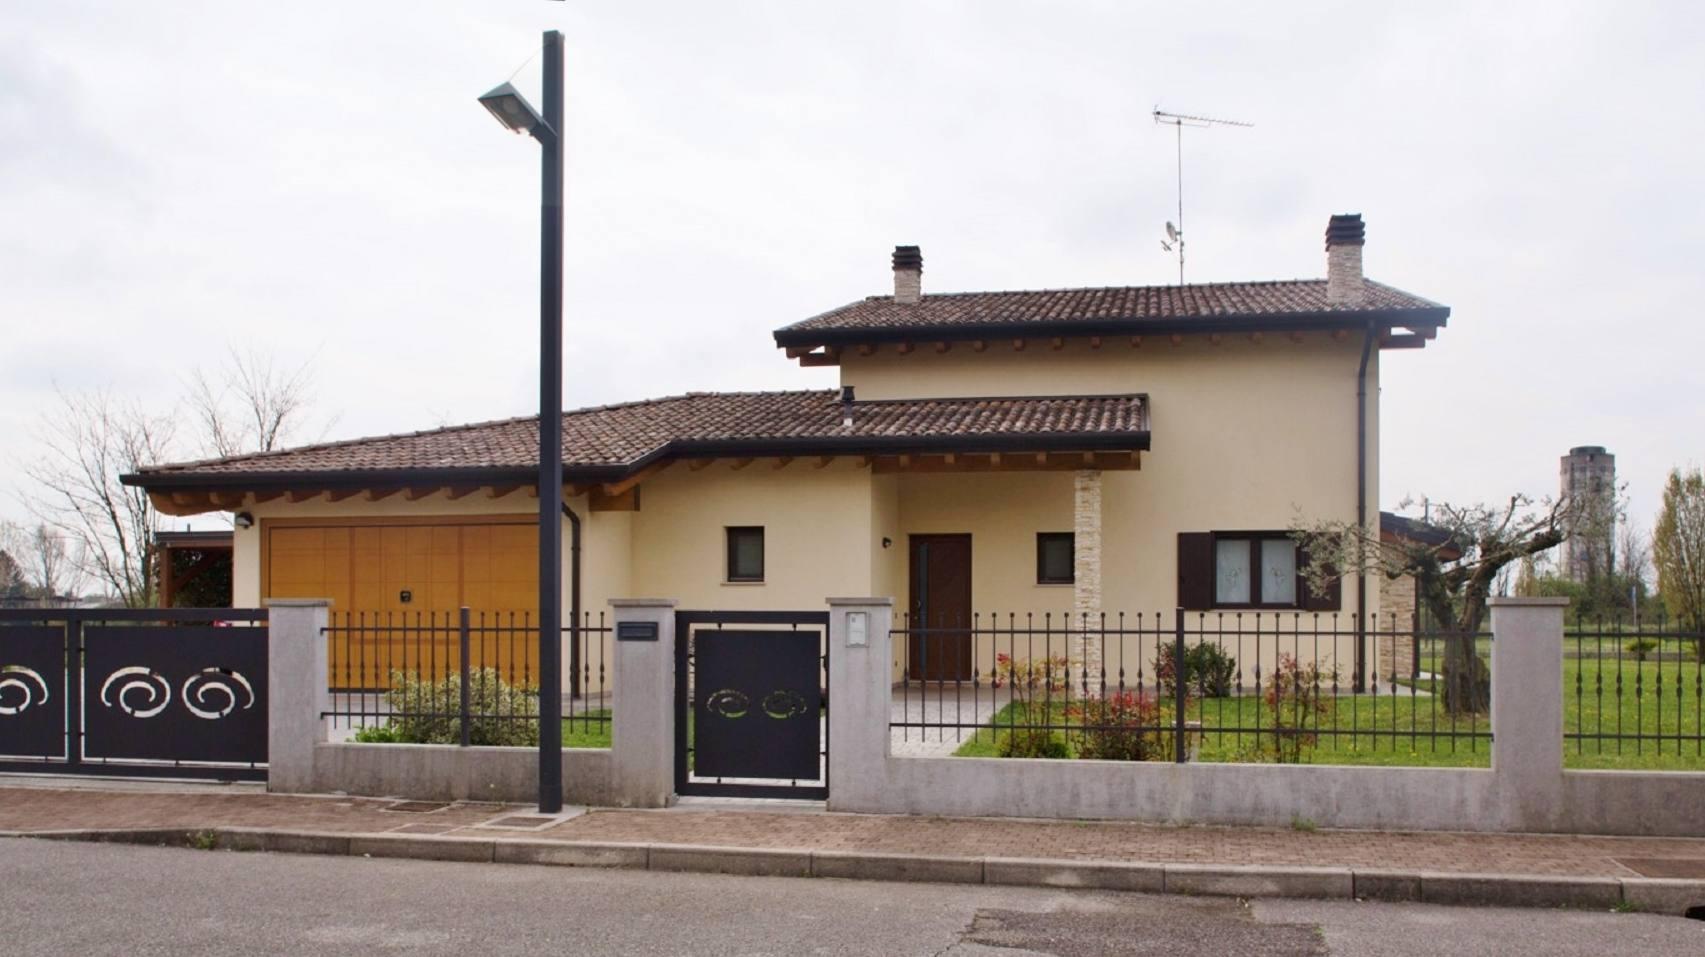 Manzano (UD)